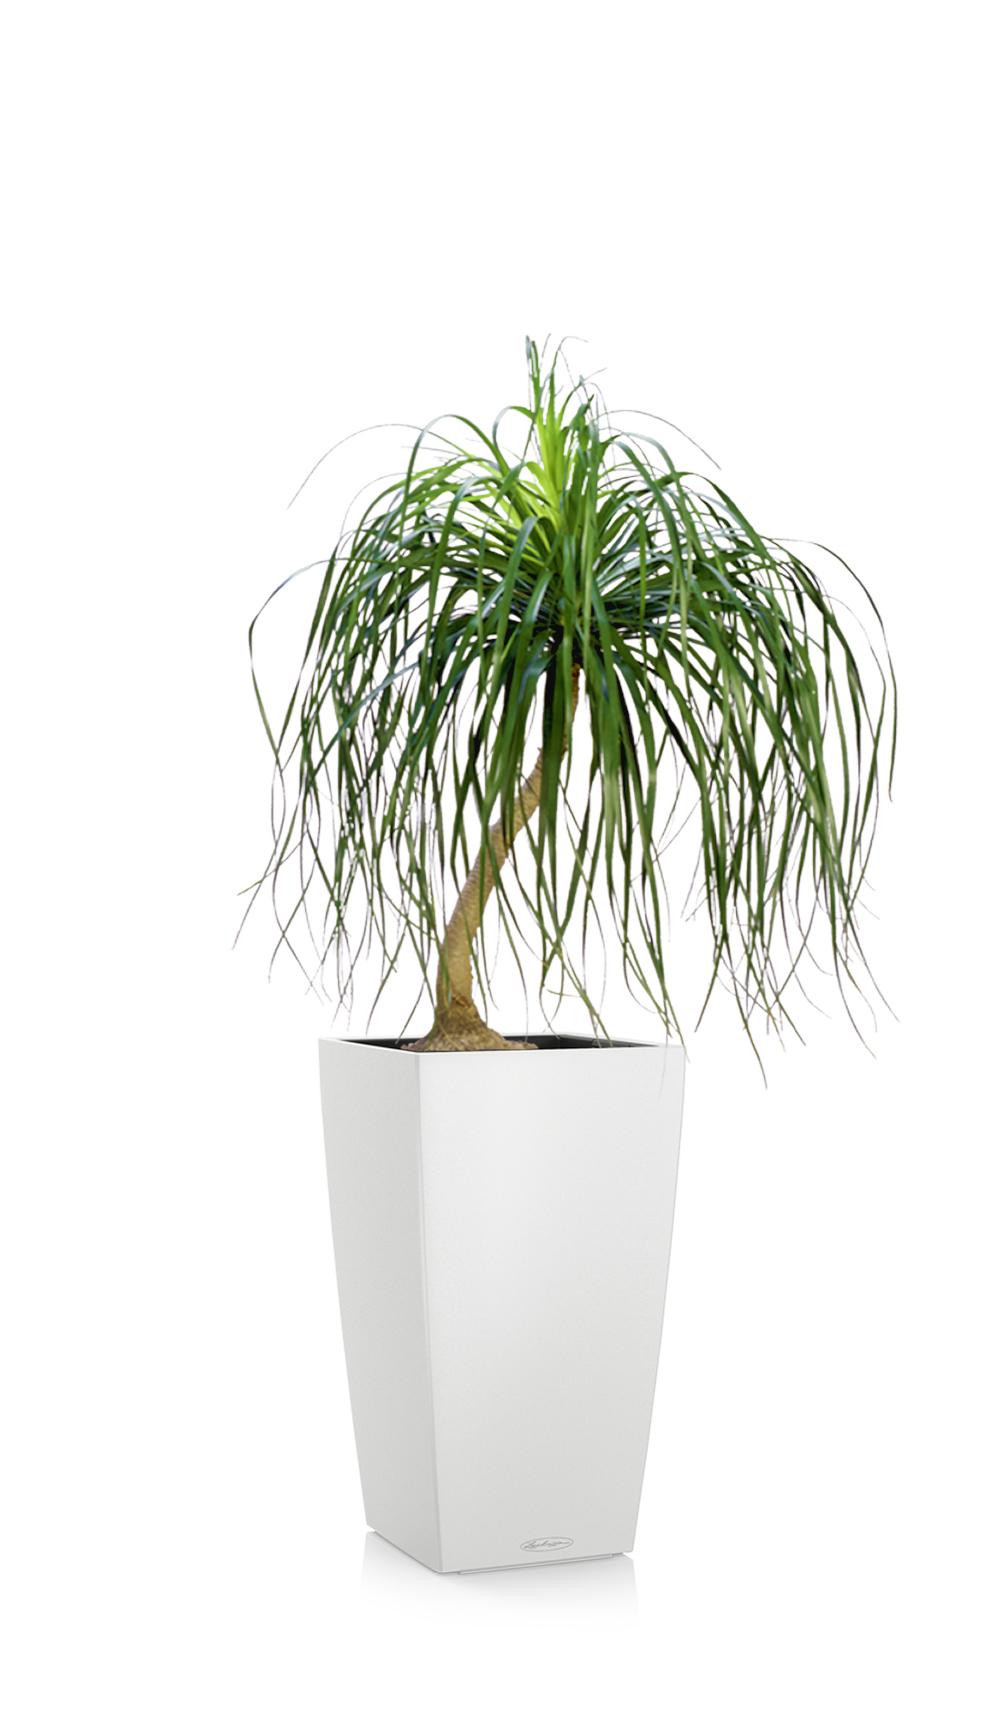 greenleaf_medhigh light_pony tail palm